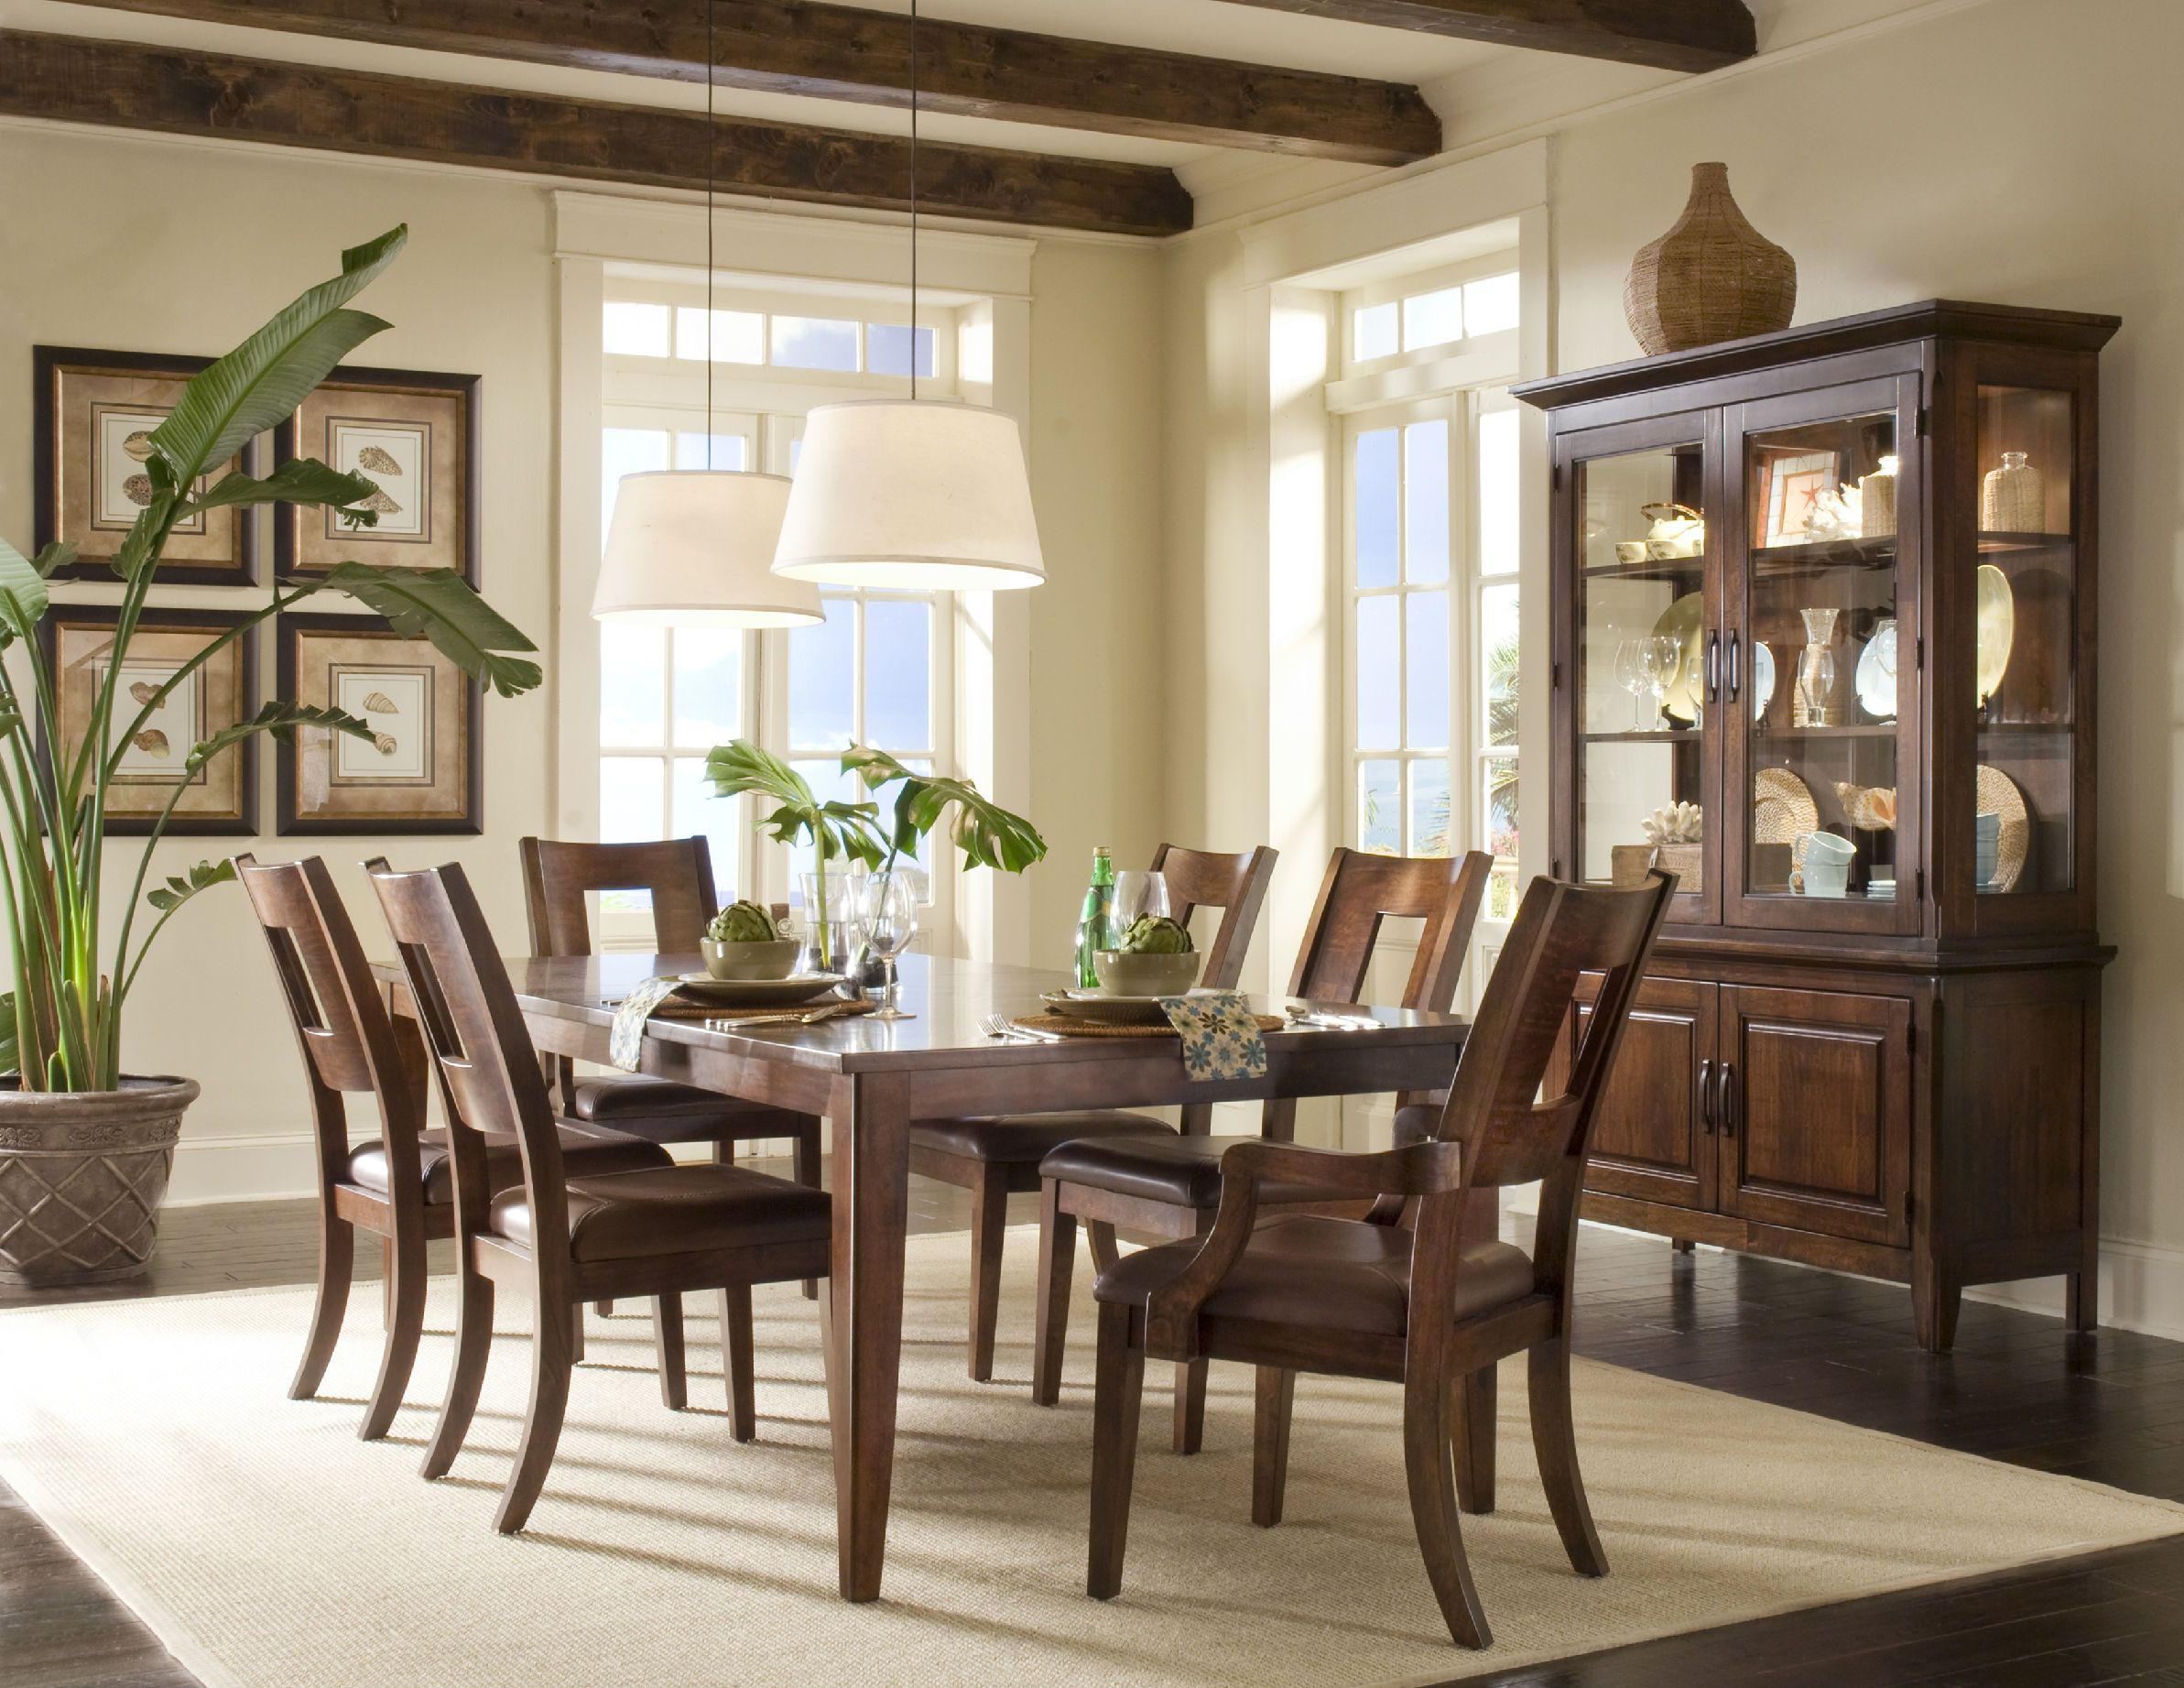 Klaussner Dining Room Furniture